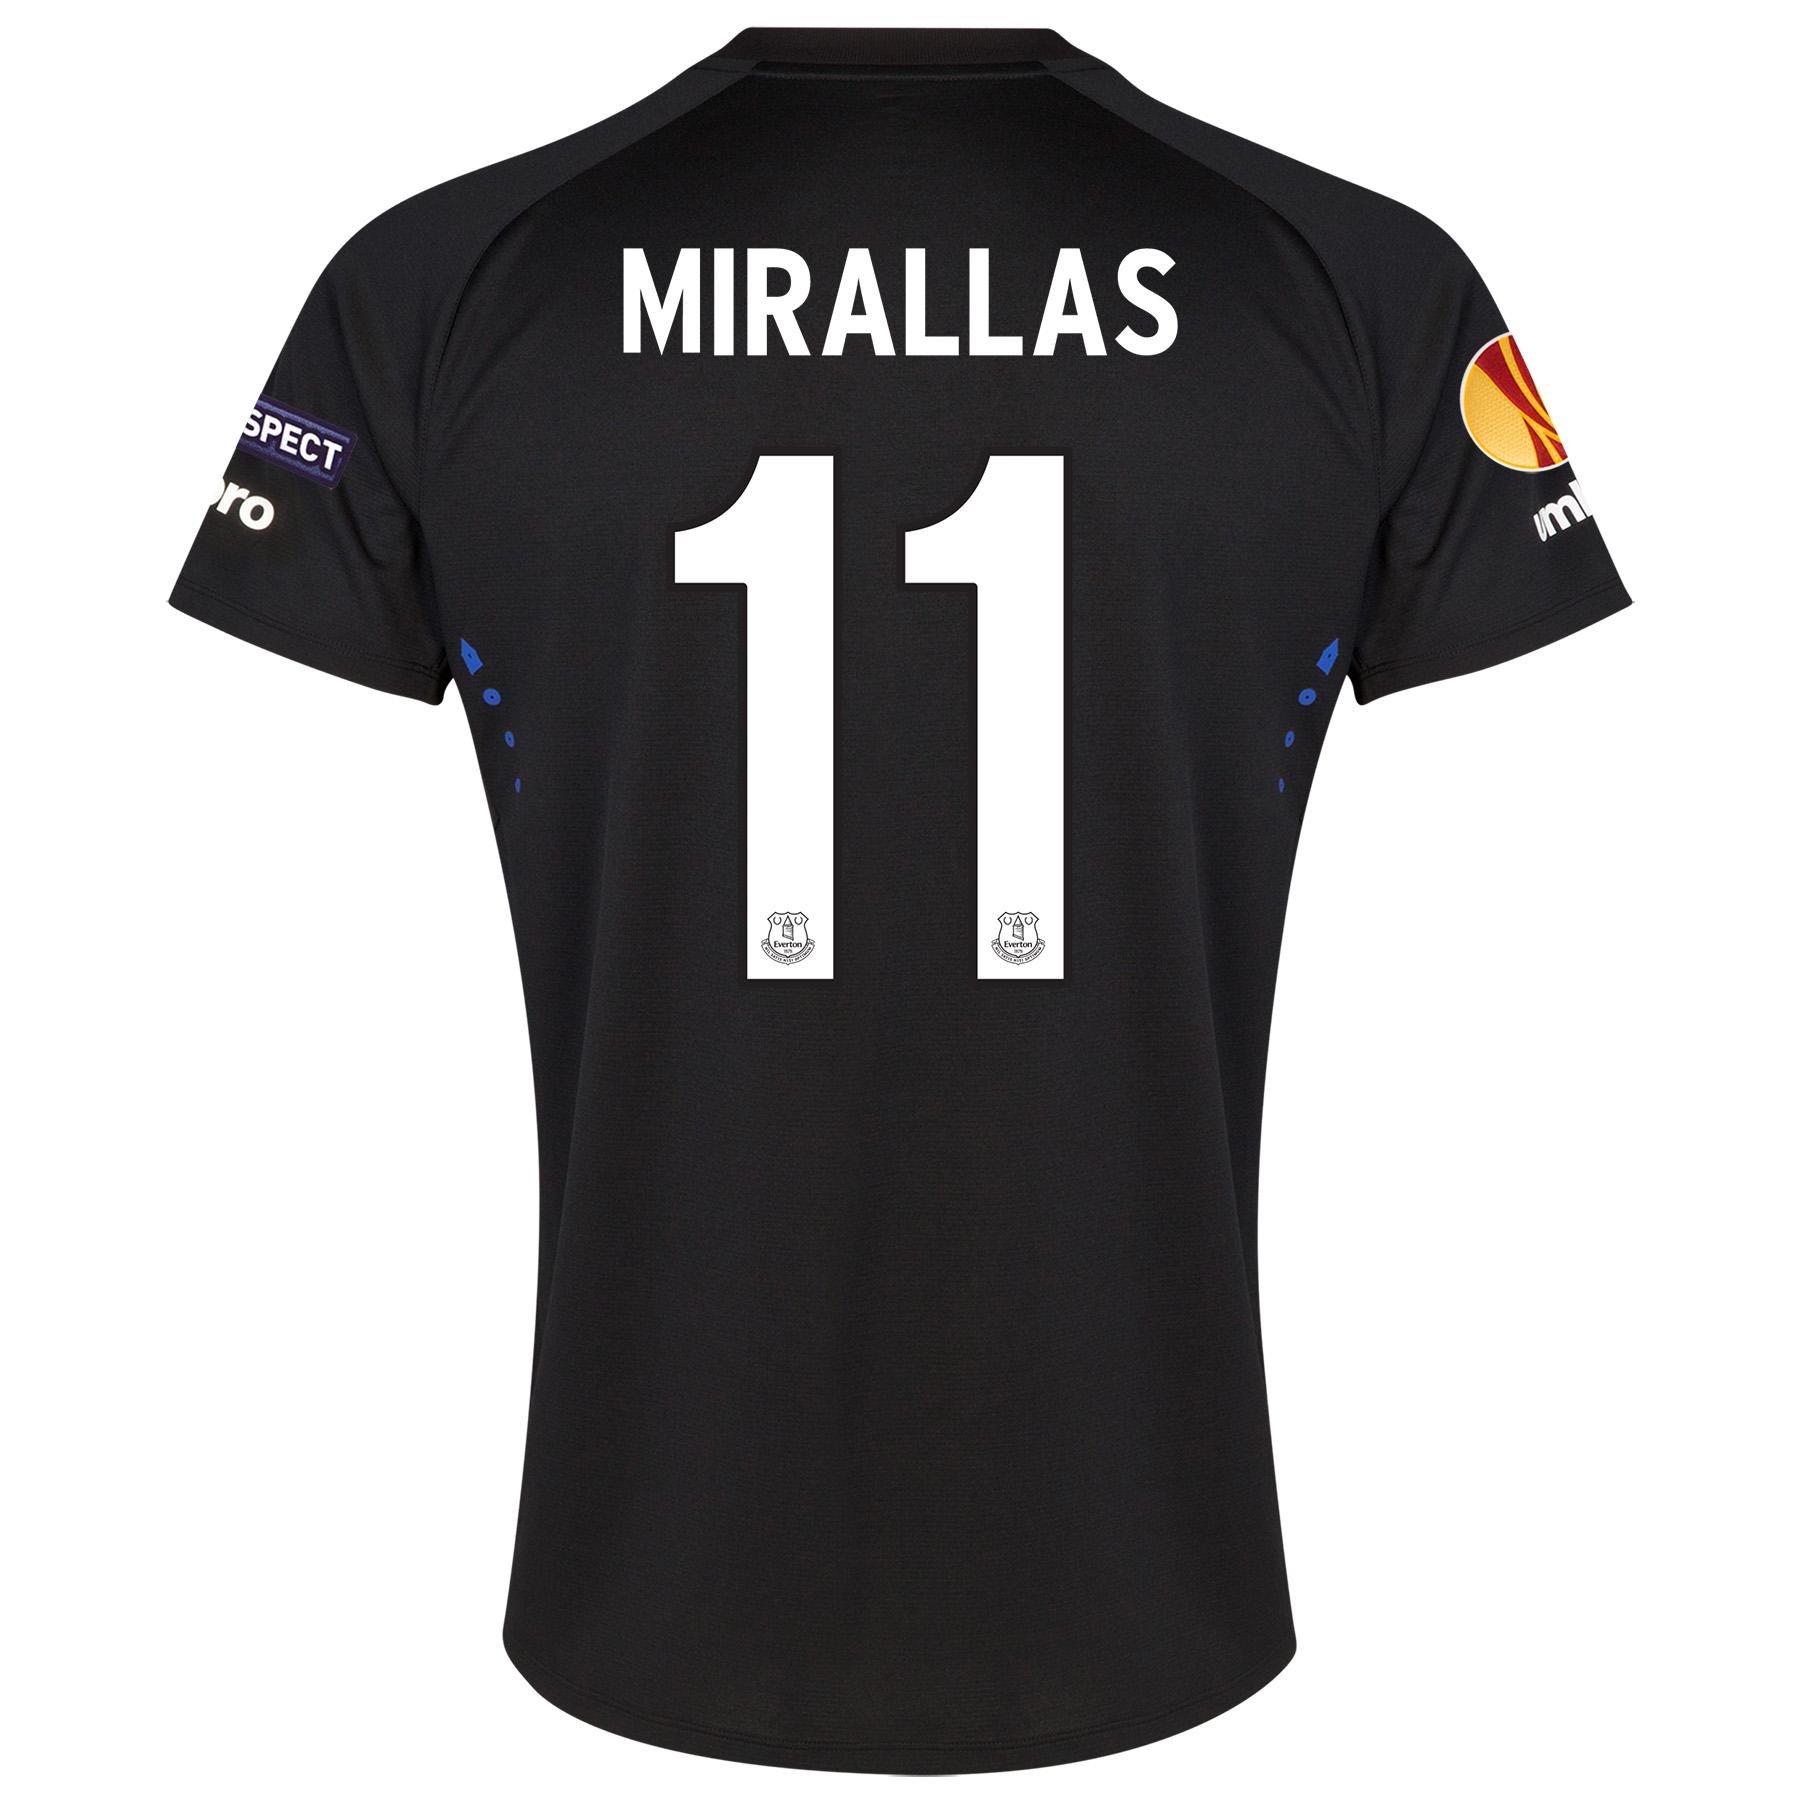 Everton UEFA Europa League Away Shirt 2014/15 SS - Junior with Mirallas 11 printing